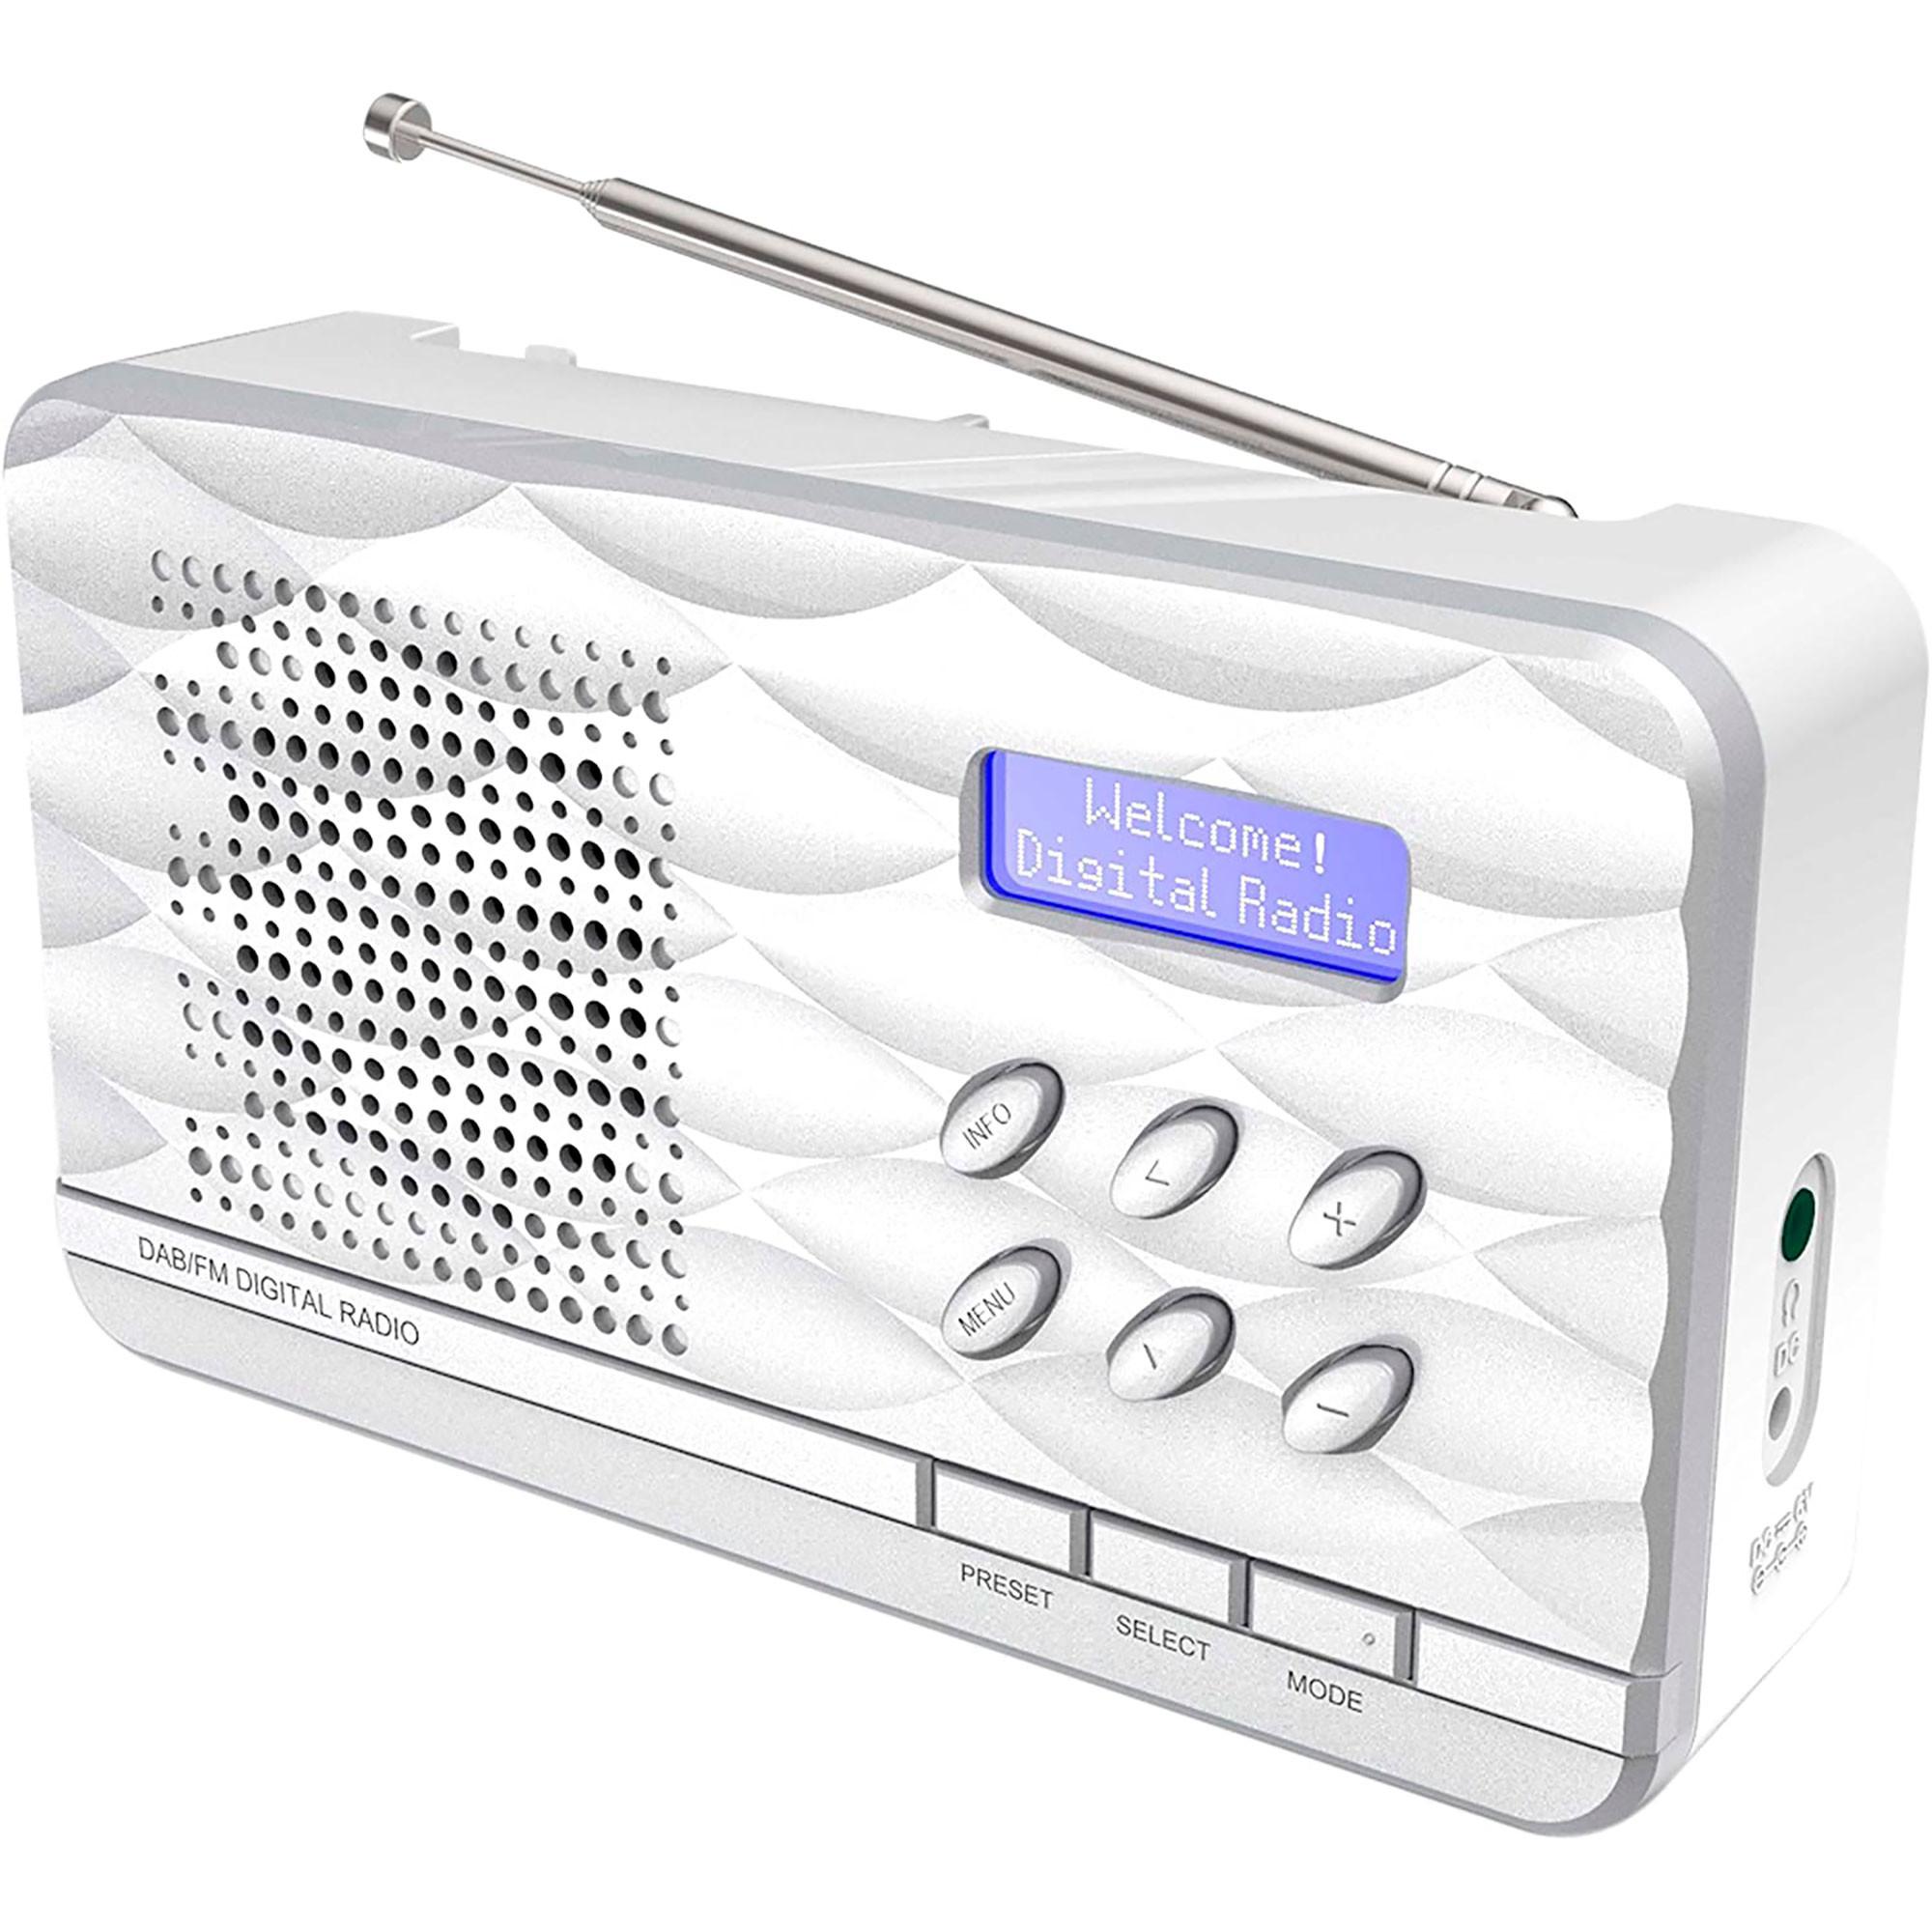 Soundmaster DAB500SI Radio Portátil AM, FM y DAB+, Sintonizador Digital, Compacta, Pantalla LED, Color Plata